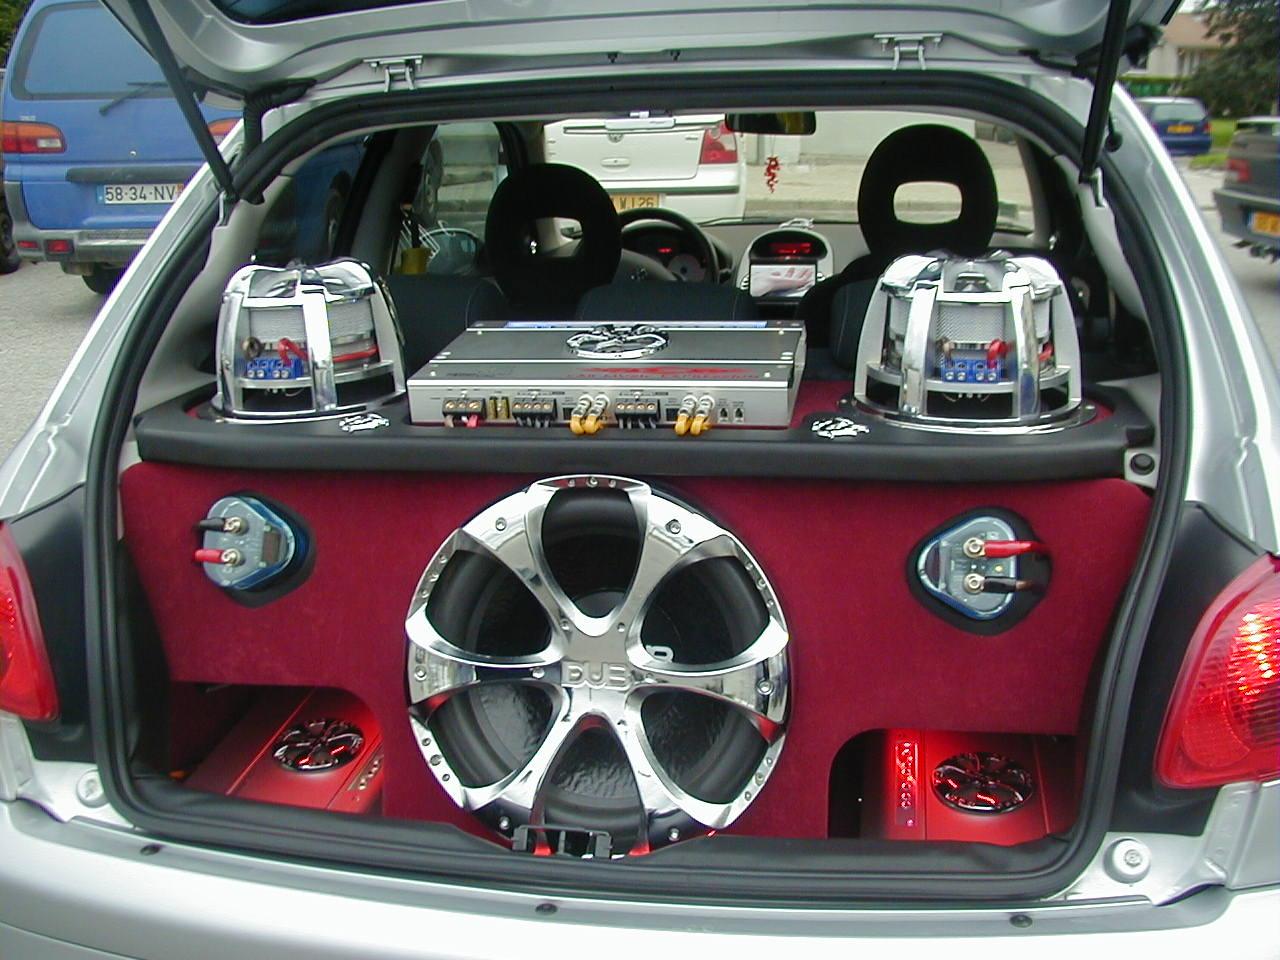 dream team car tuning clug mamour206. Black Bedroom Furniture Sets. Home Design Ideas